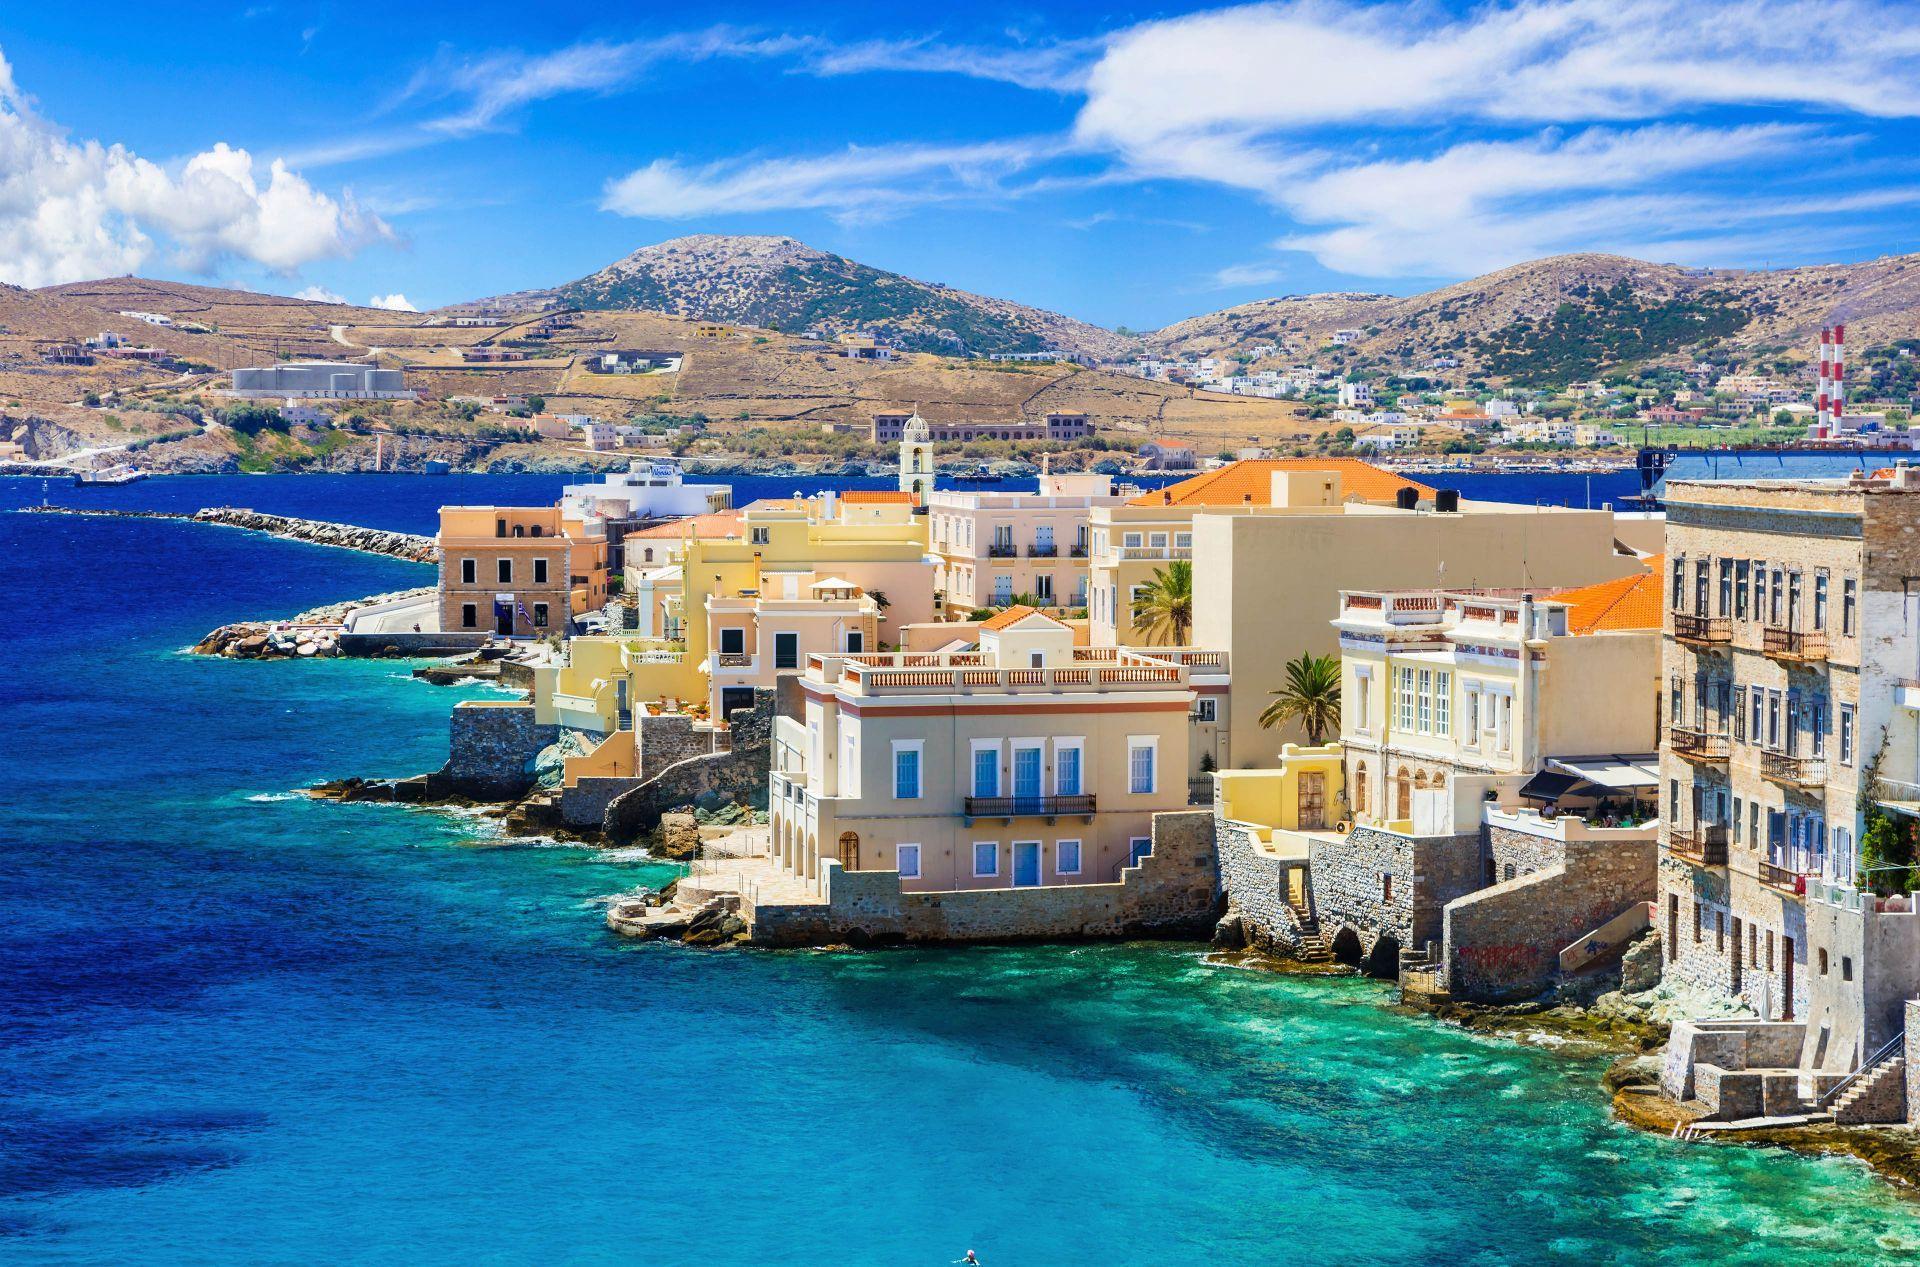 Syros island: Vaporia